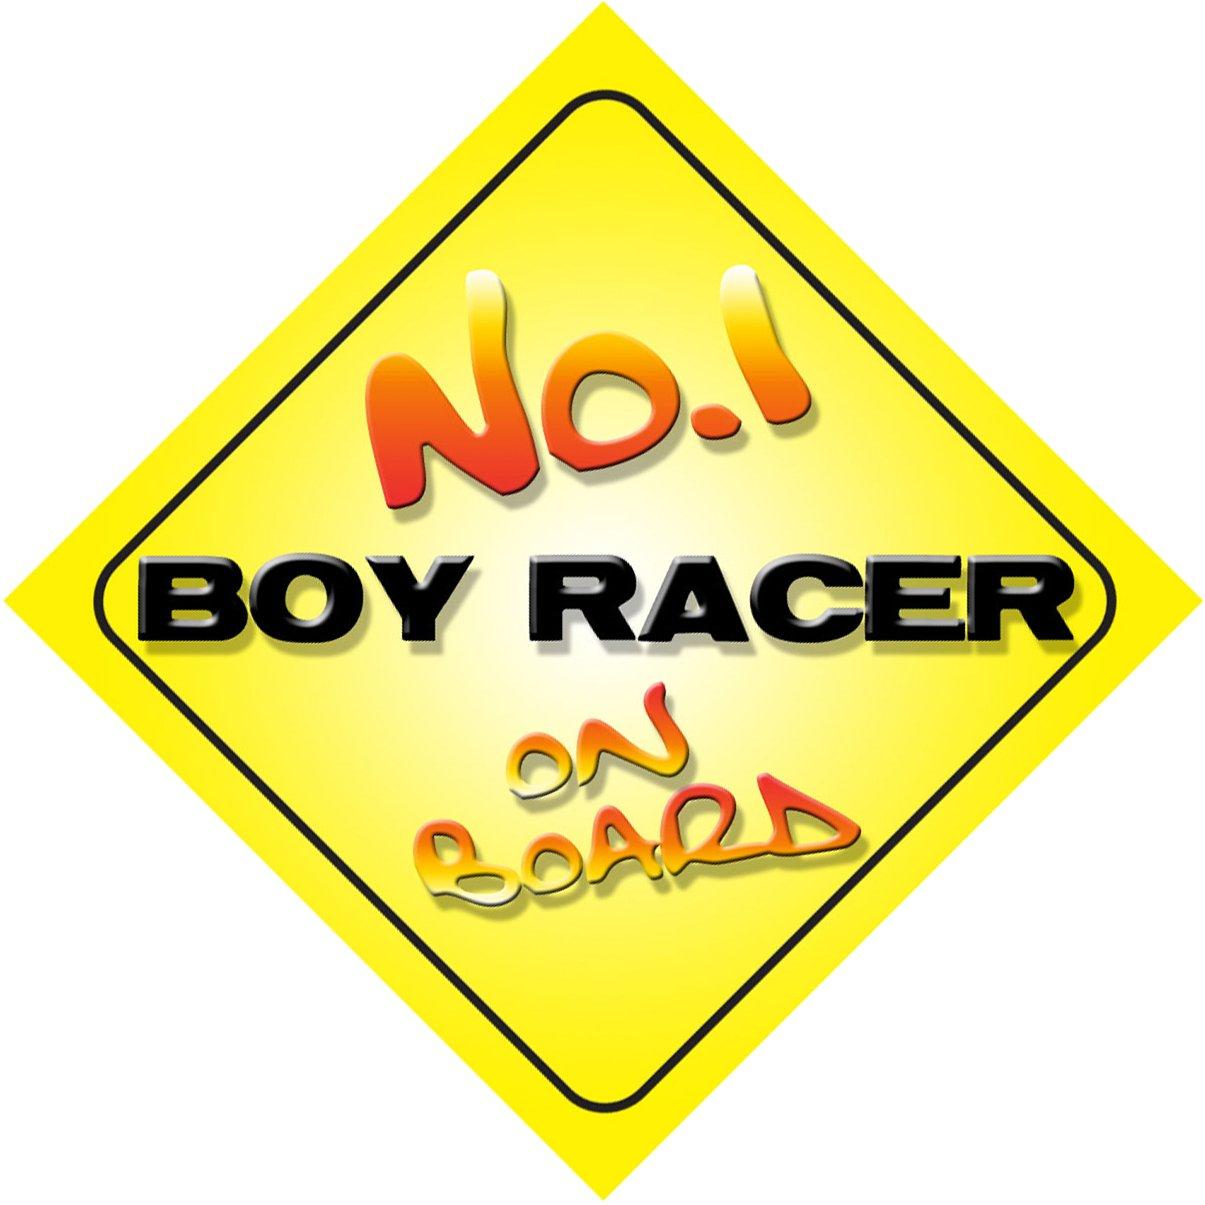 No.1 Boy Racer on Board Novelty Car Sign New Job//Promotion//Novelty Gift//Present